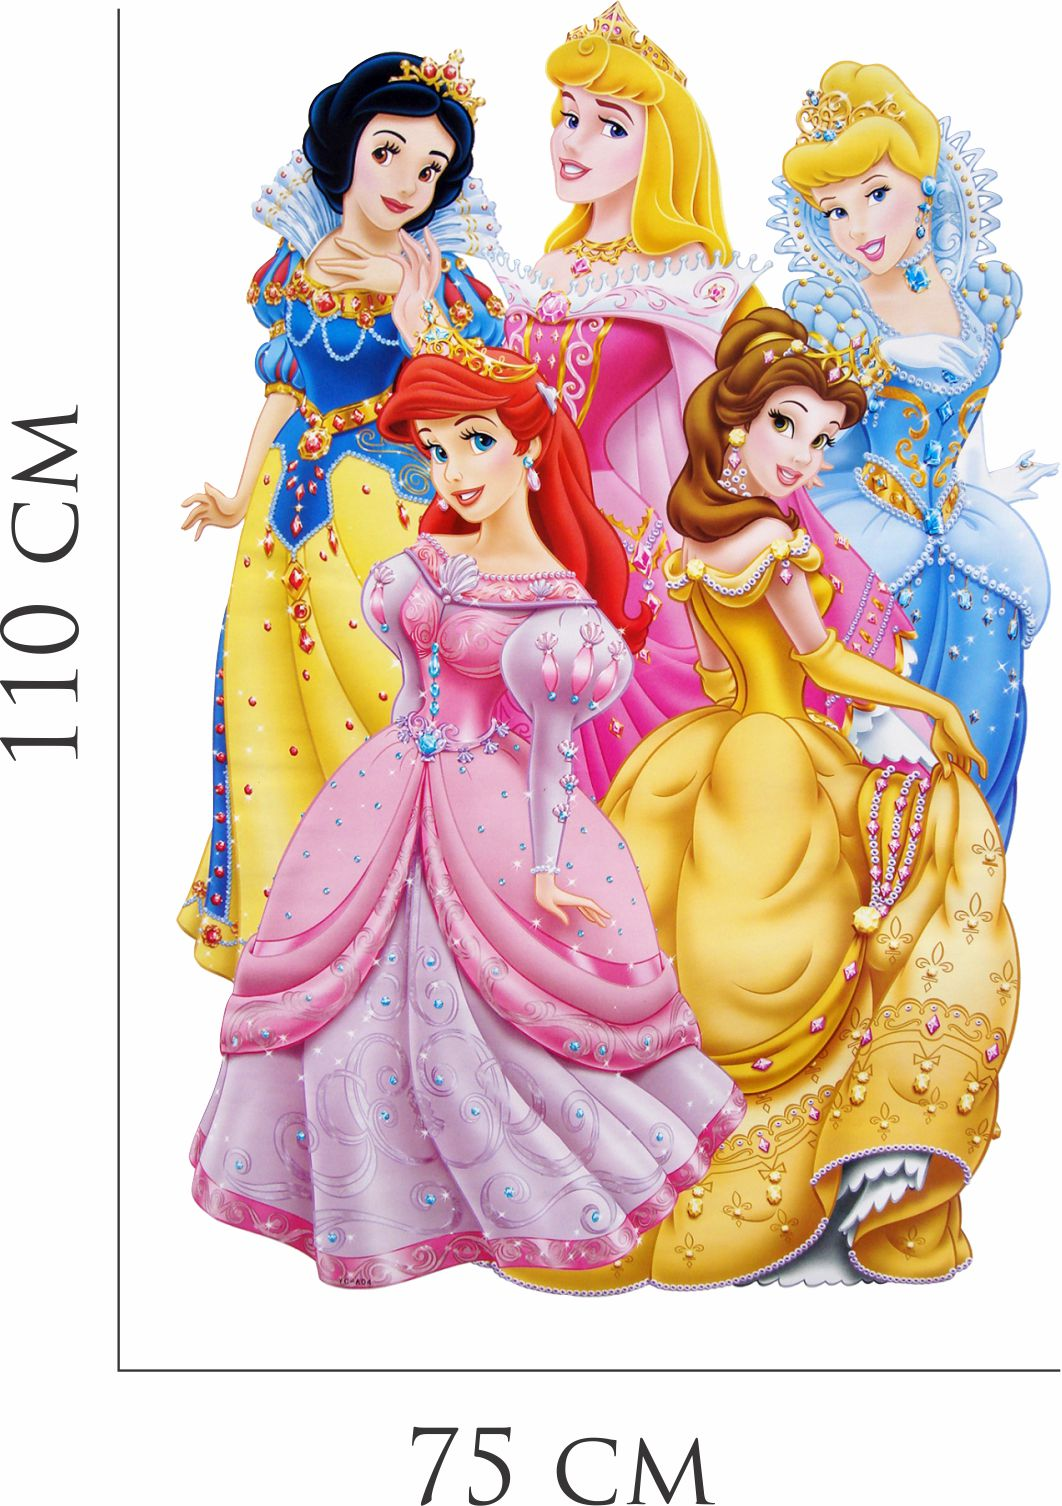 Adesivo Papel De Parede Princesas Branca Neve Cinderela No Elo7